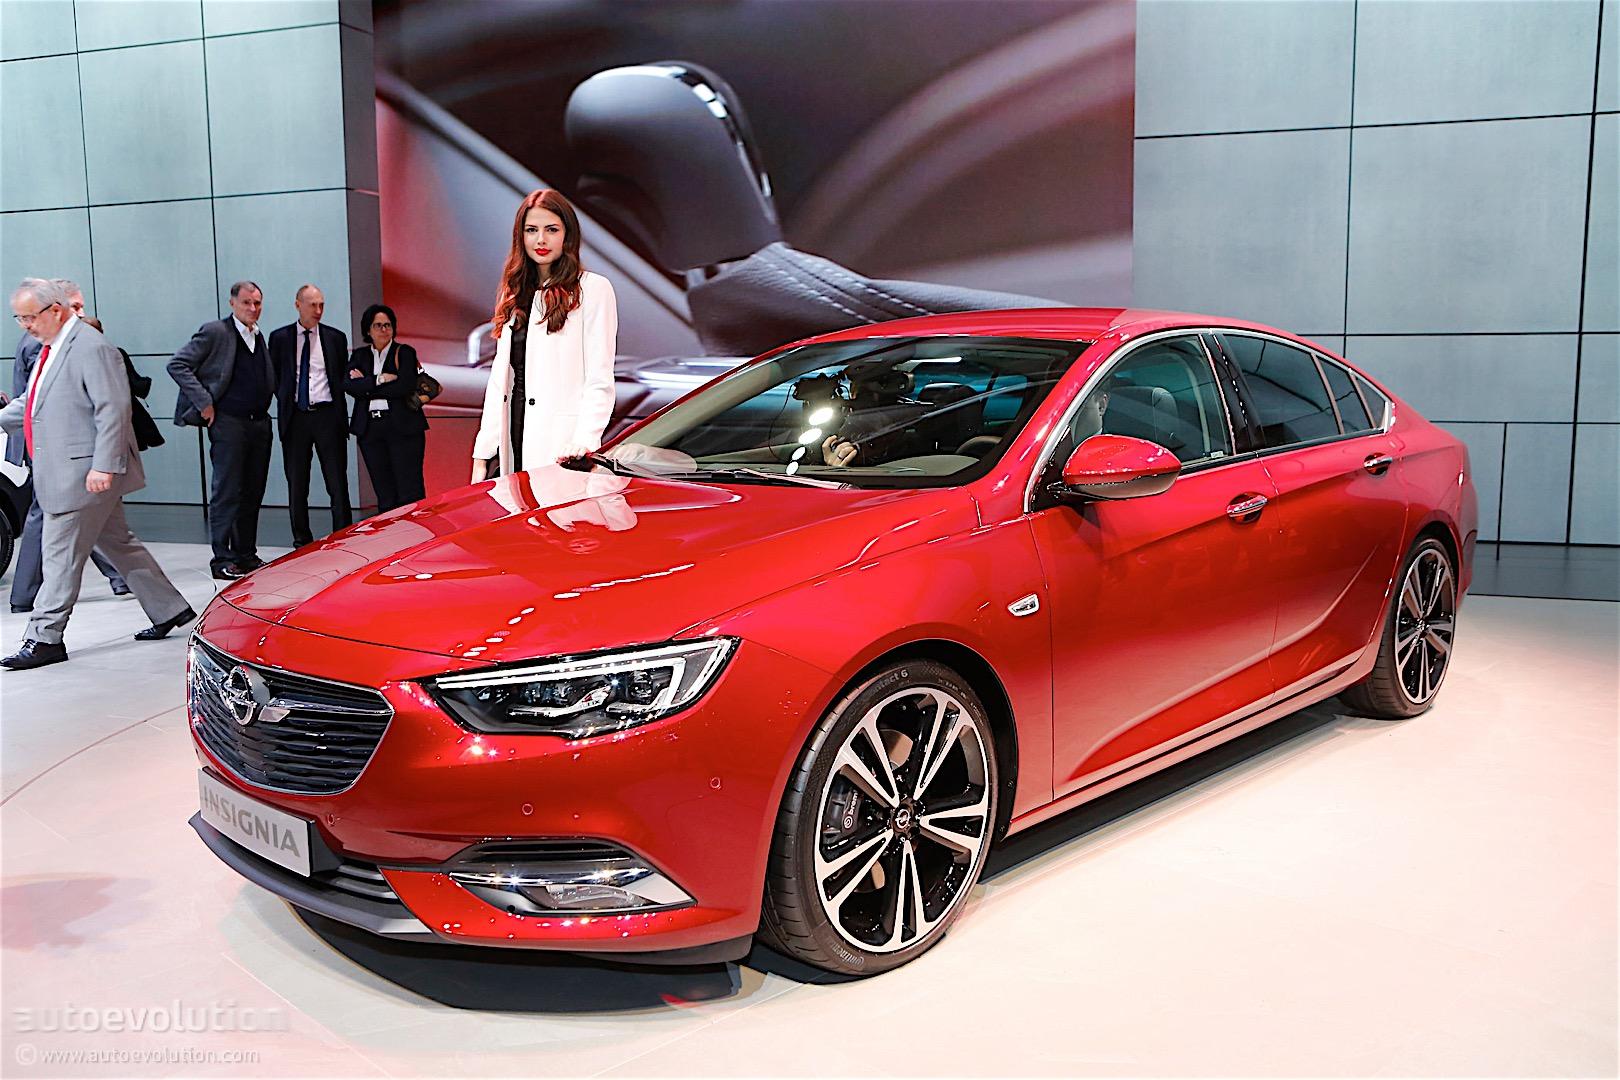 Second Generation Opel Insignia Showcased In Geneva Its